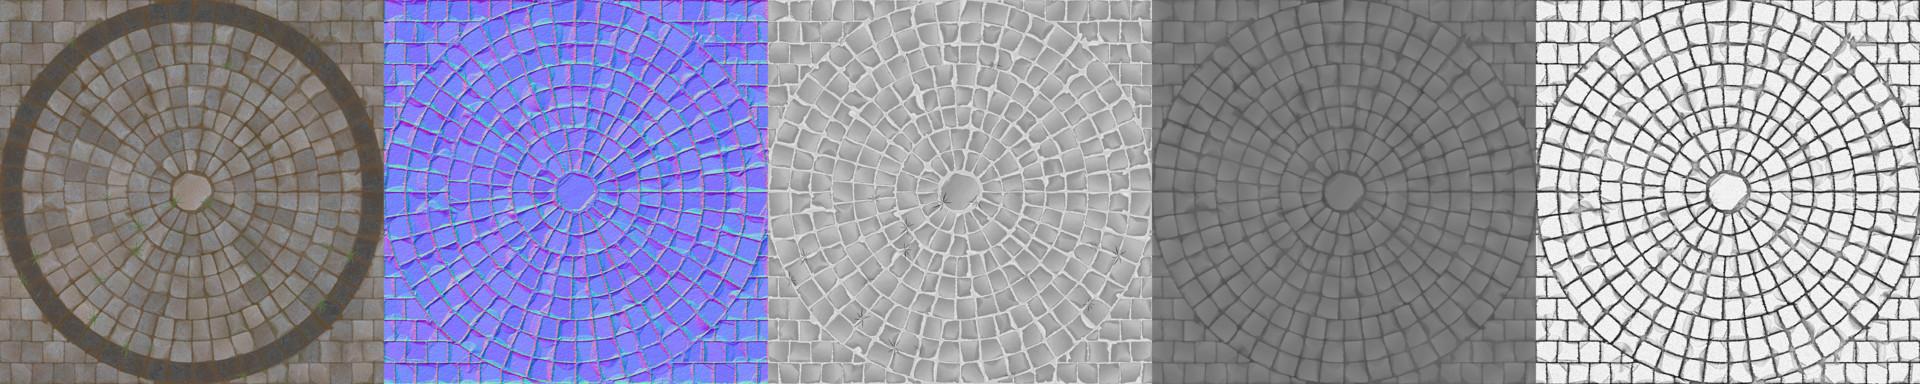 Markus pichler cobblestone textures